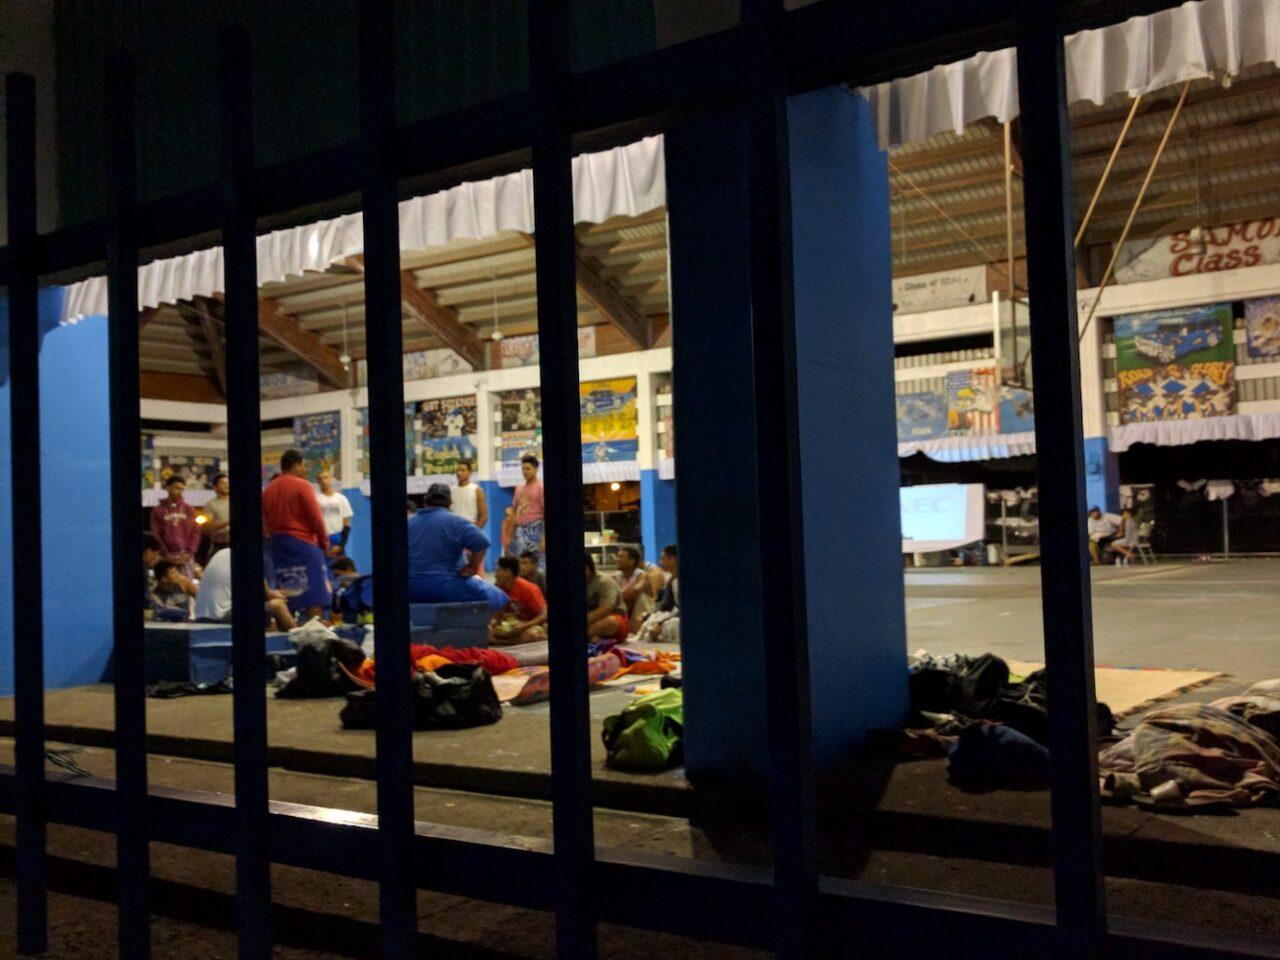 G – Samoan boys prepping for football season by having a team spirit meeting sleepover – NFL is their ticket off the island